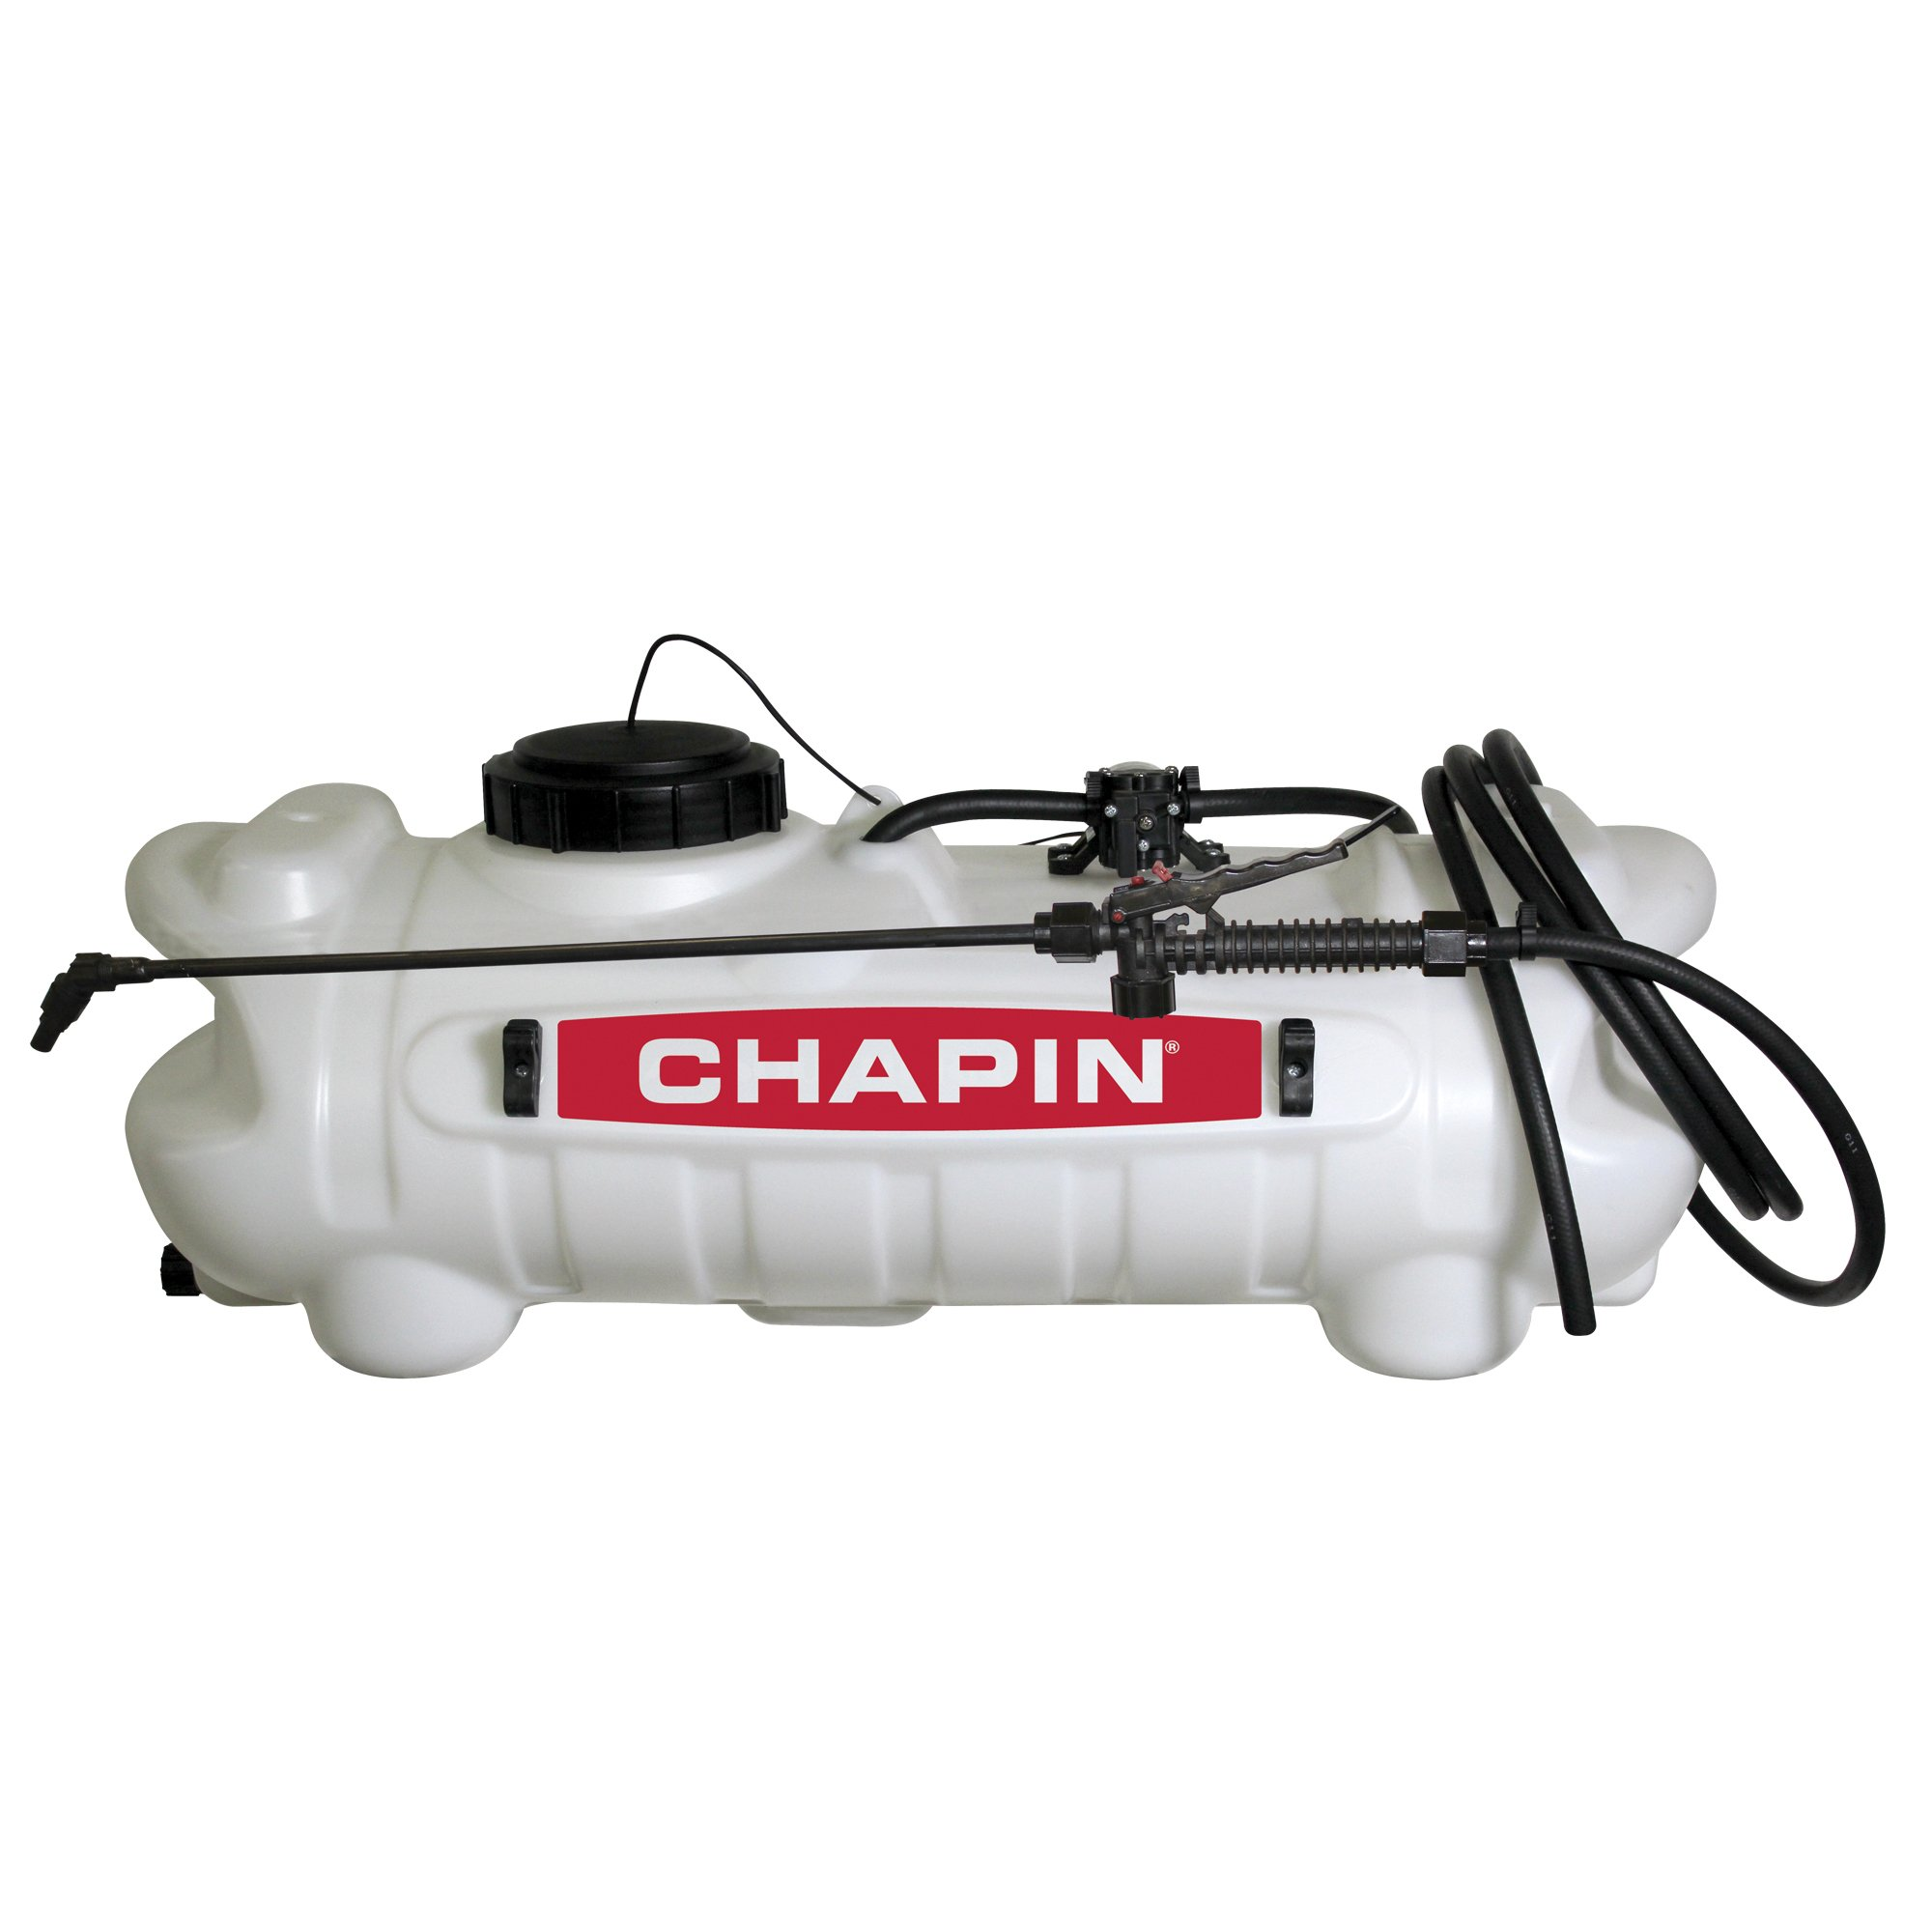 Chapin 97200 15-Gallon, 12-volt EZ Mount Fertilizer, Herbicide and Pesticide Spot Sprayer, 15-Gallon (1 Sprayer/Package)